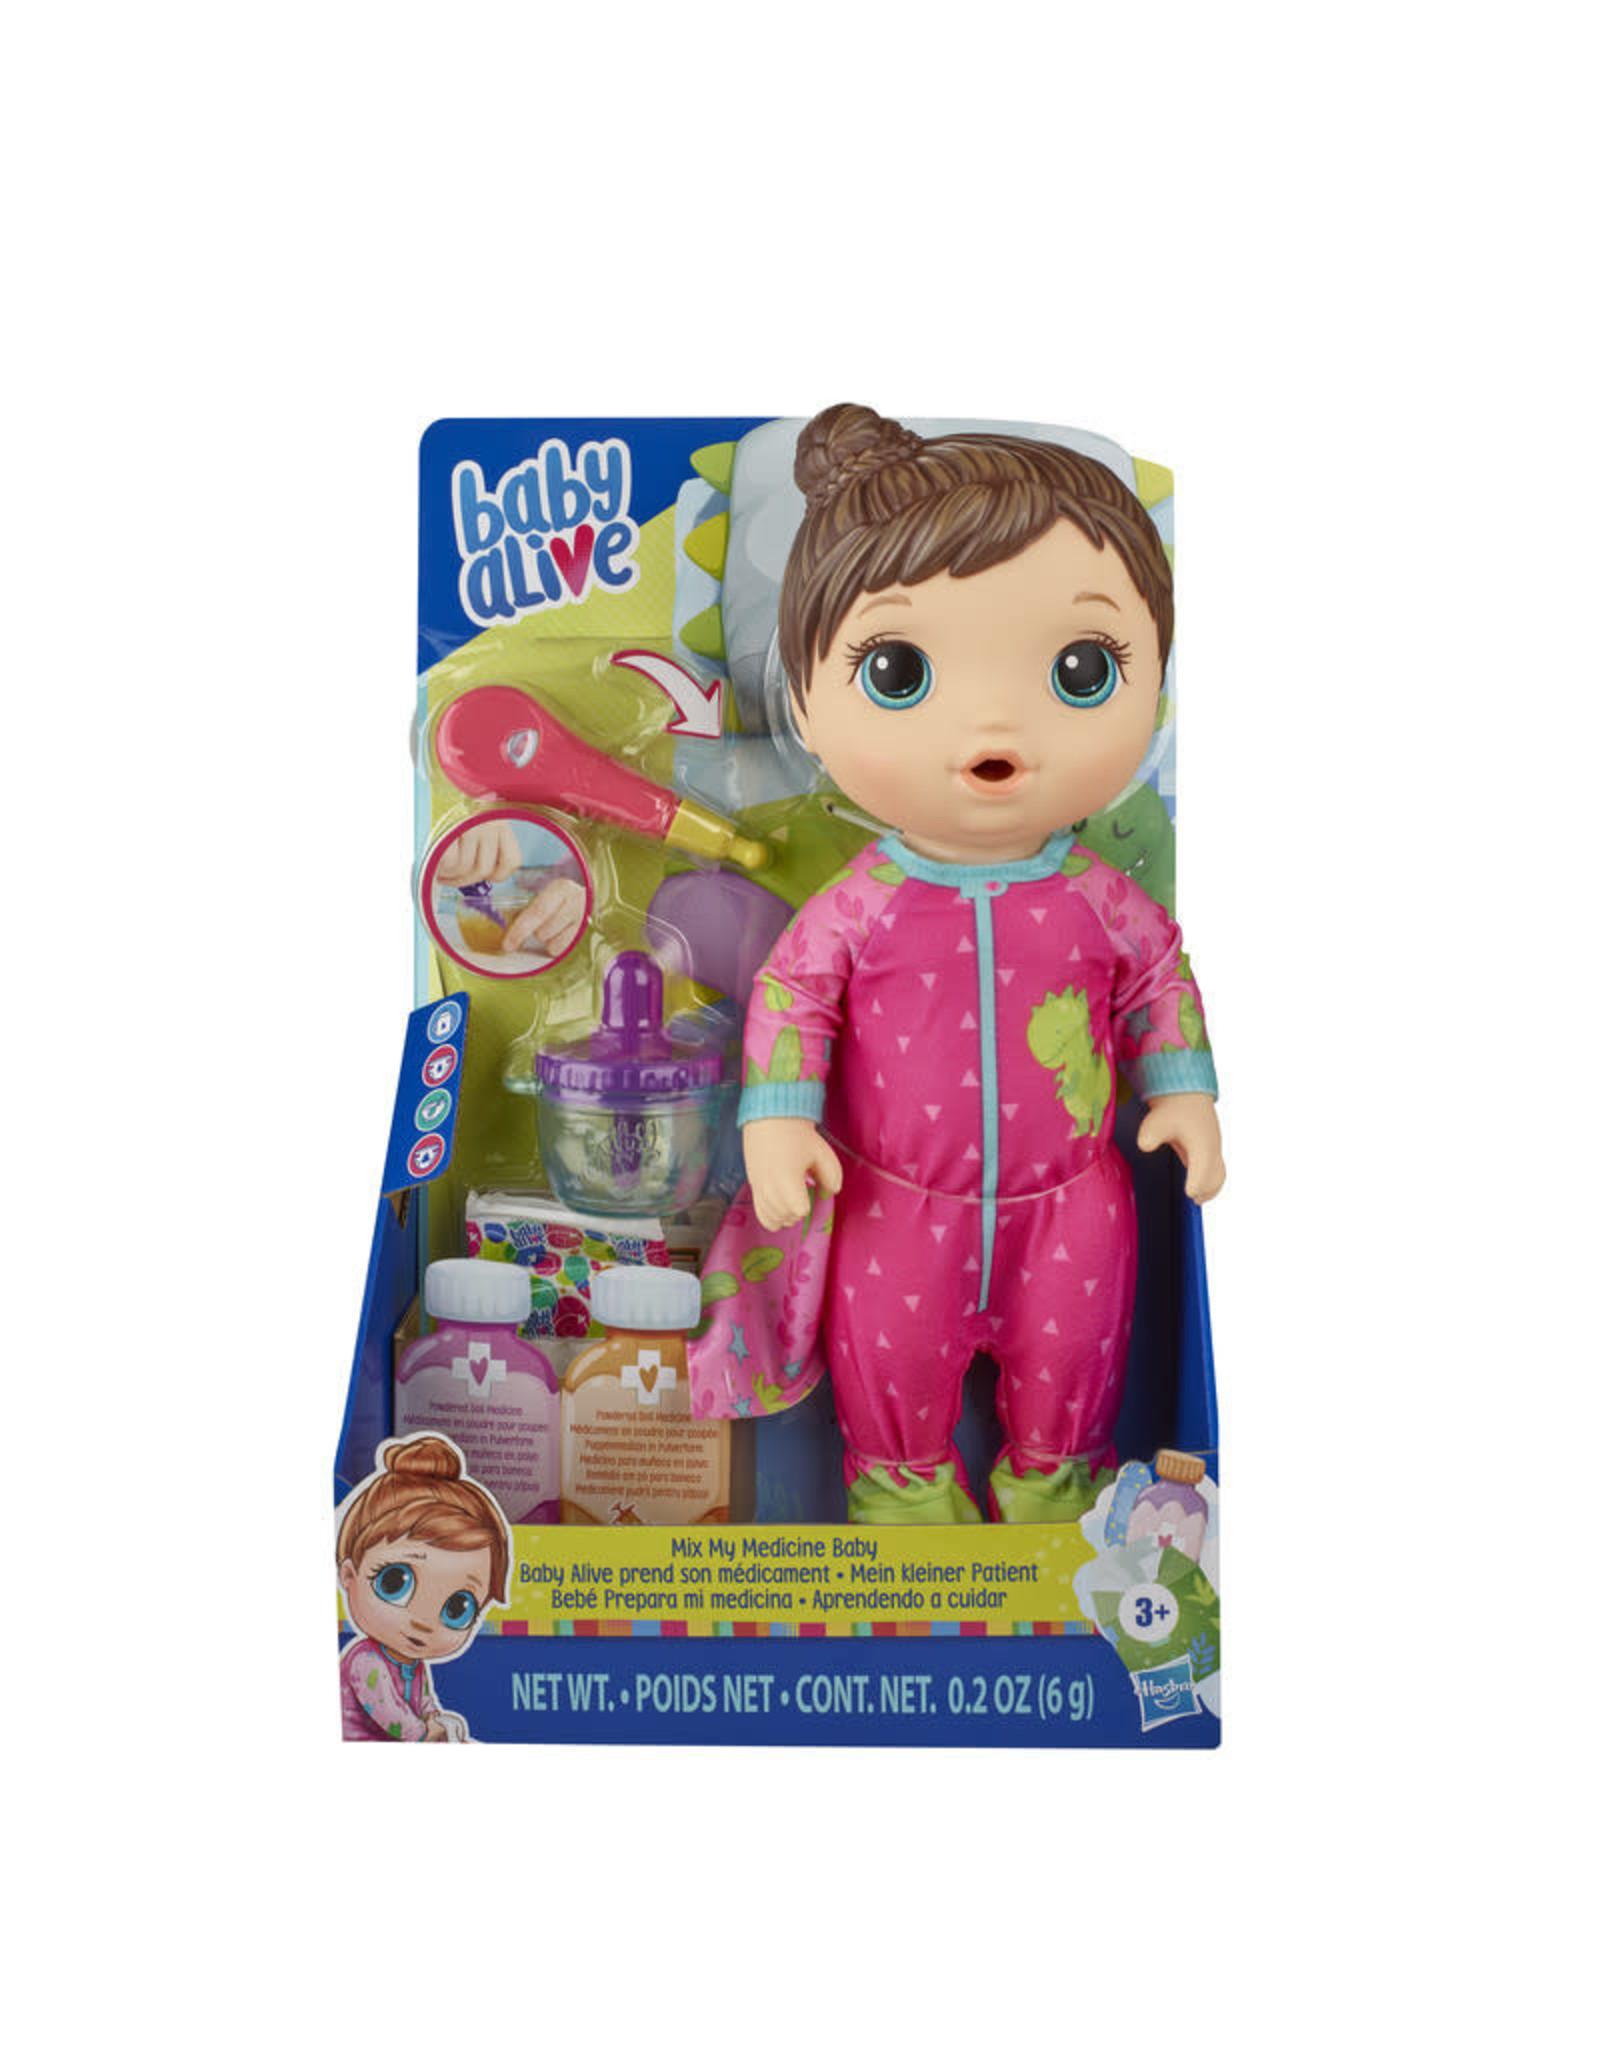 Hasbro Baby Alive Mix My Medicine